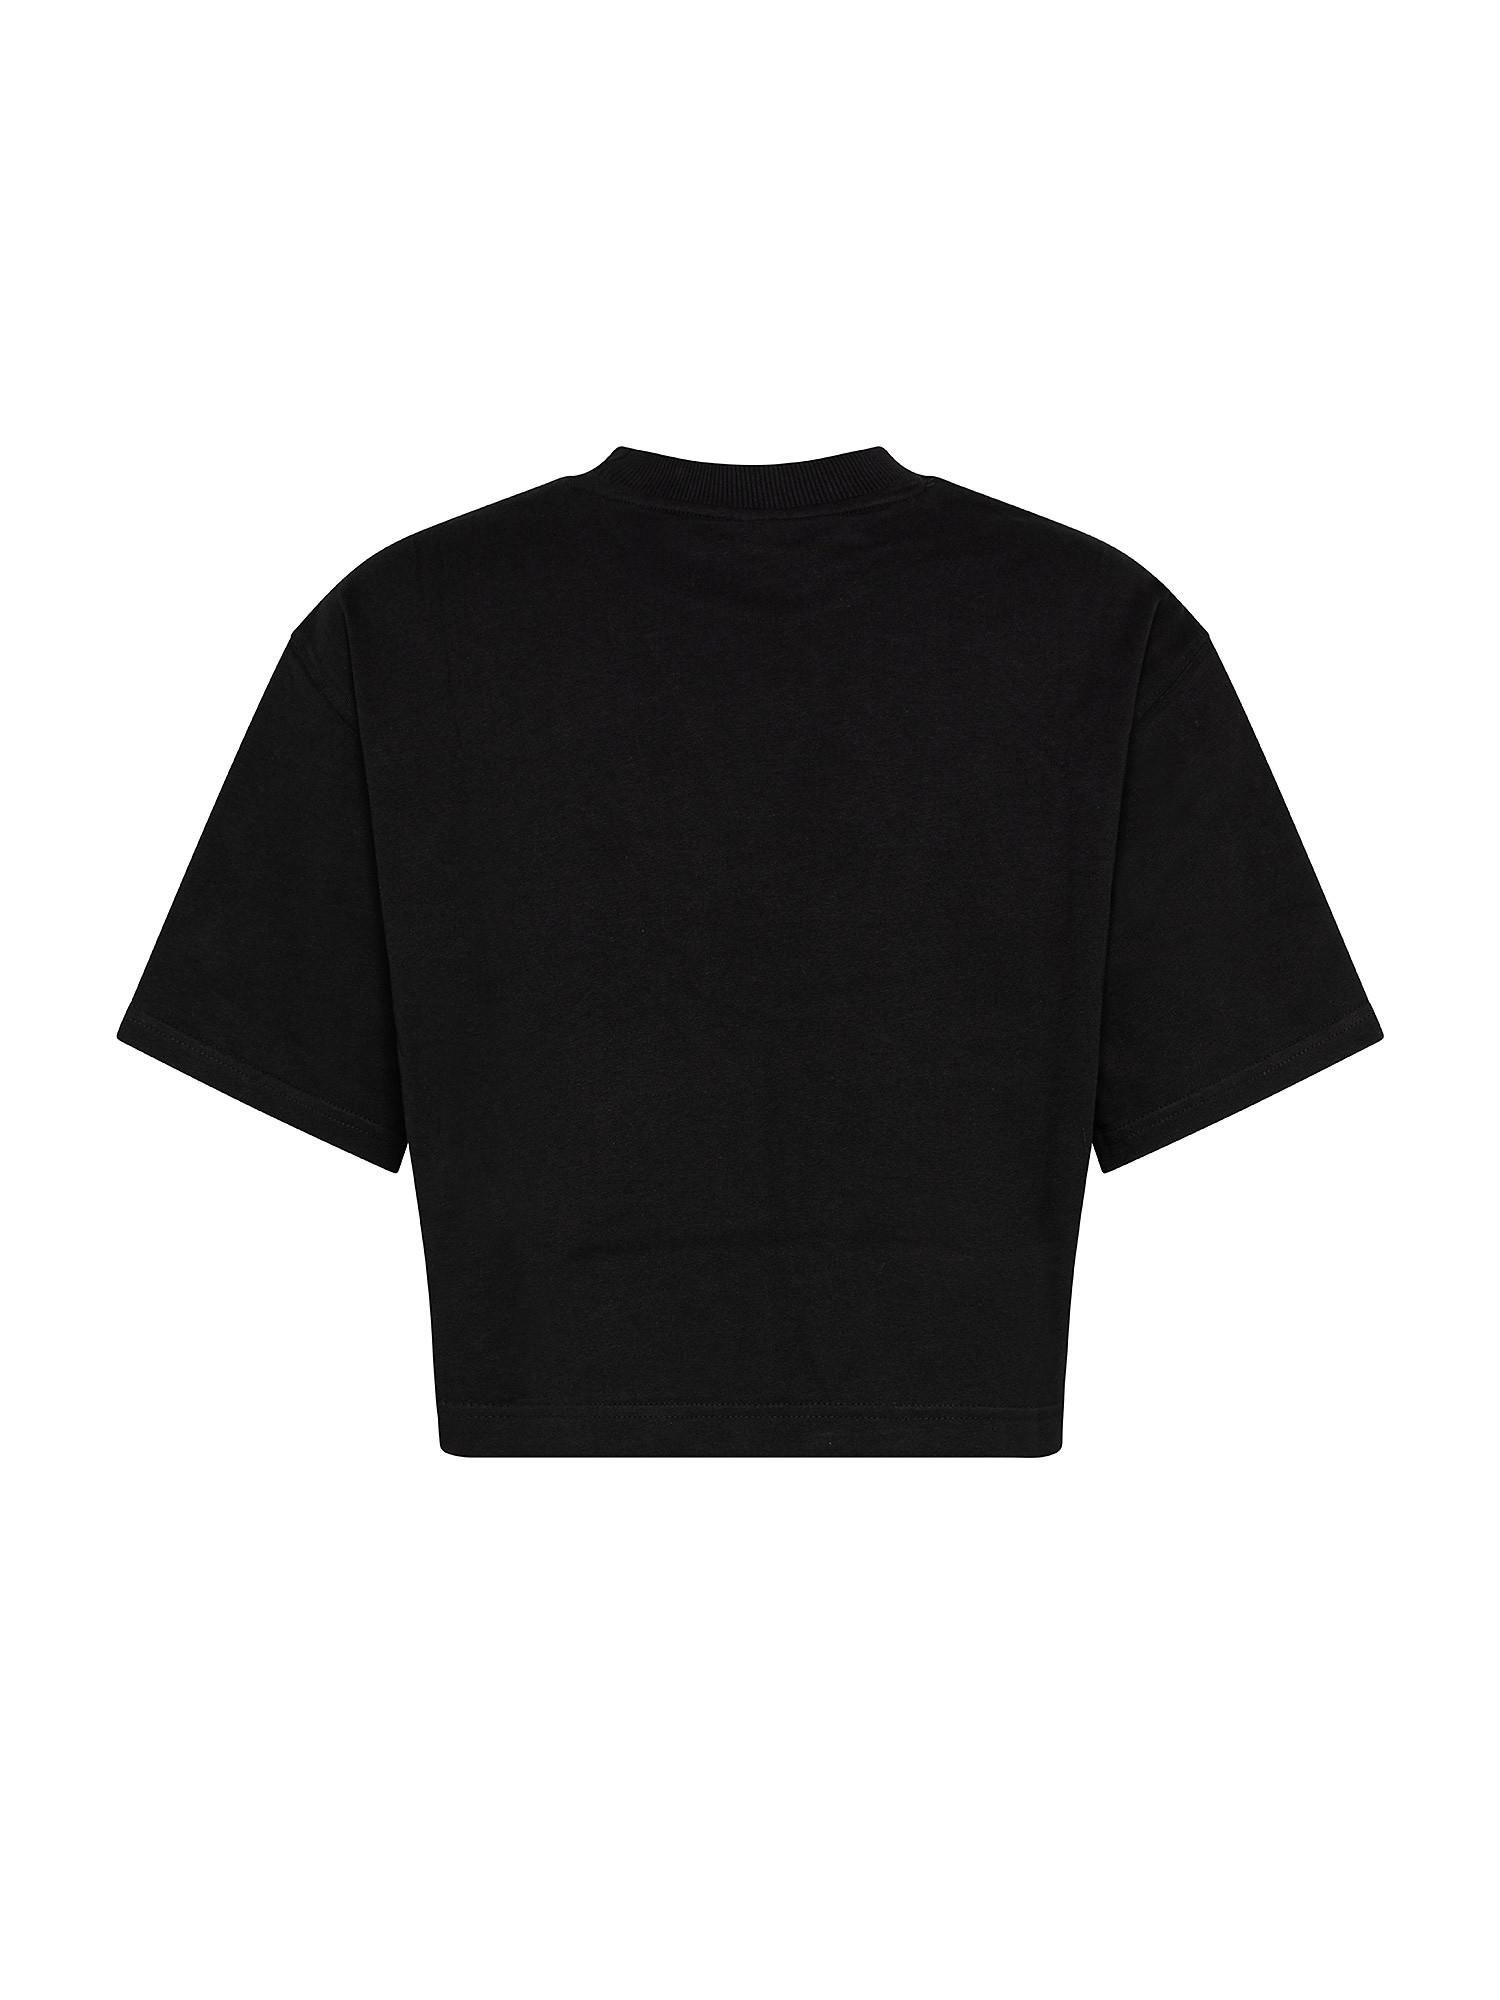 T-shirt Classics Big Logo, Multicolor, large image number 1